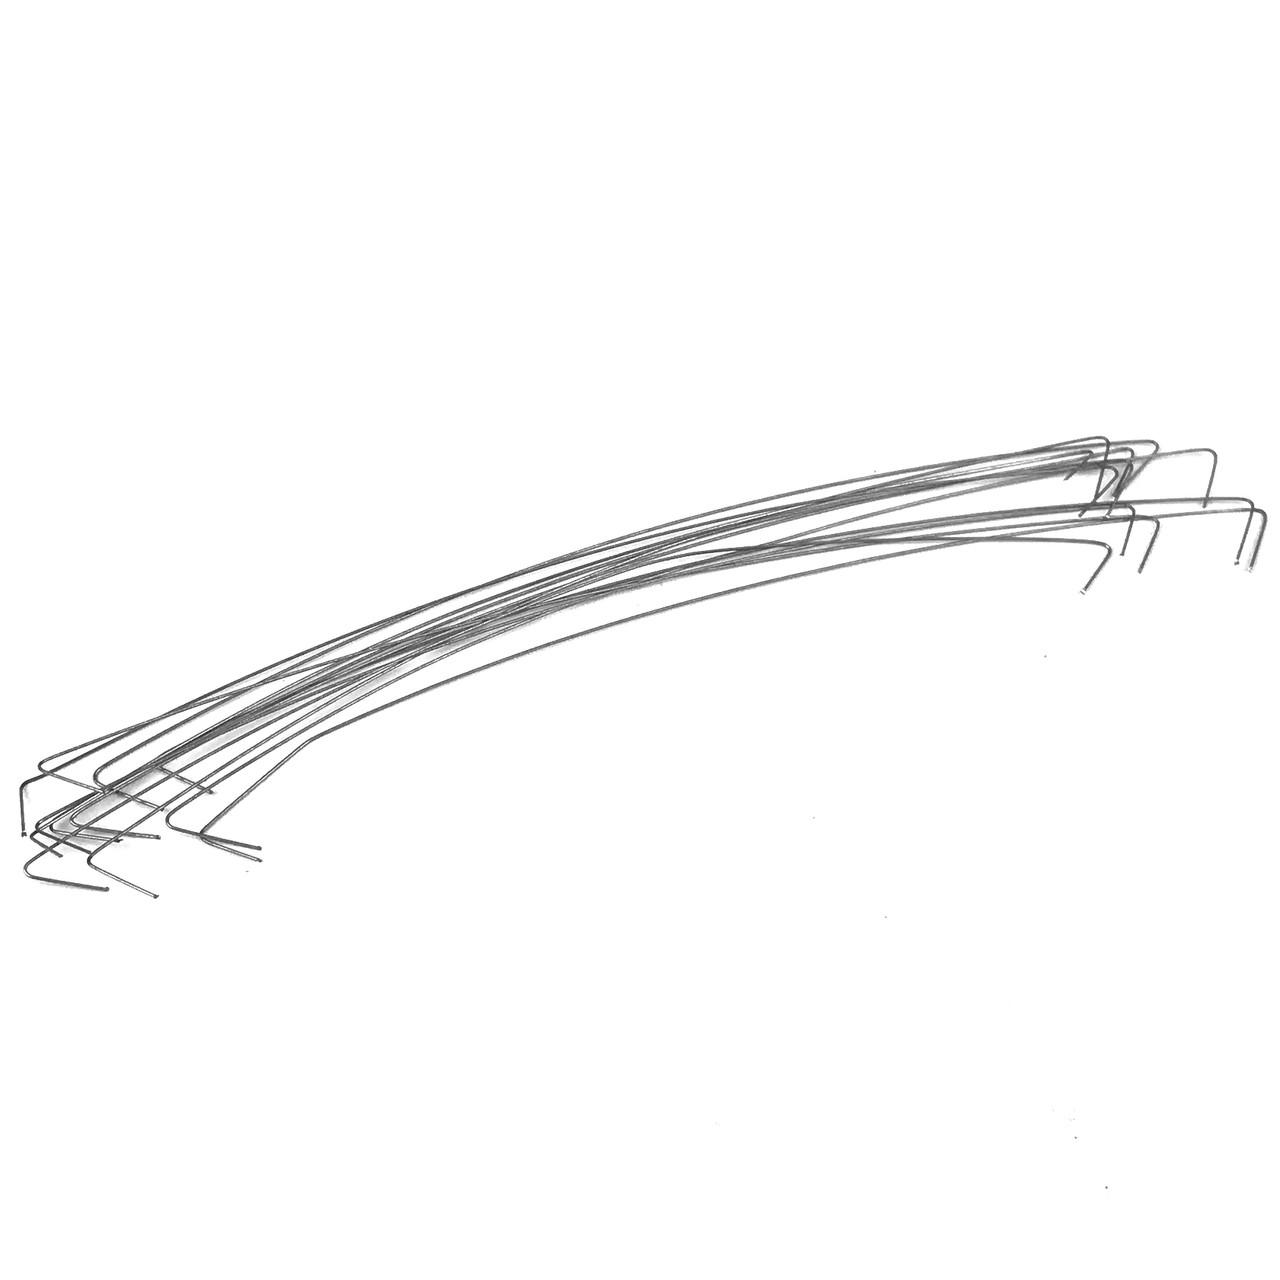 Дріт сталевий для петель прямої кишки (упаковка 12 штук). Діаметр 0,3 mm Surgiwelomed